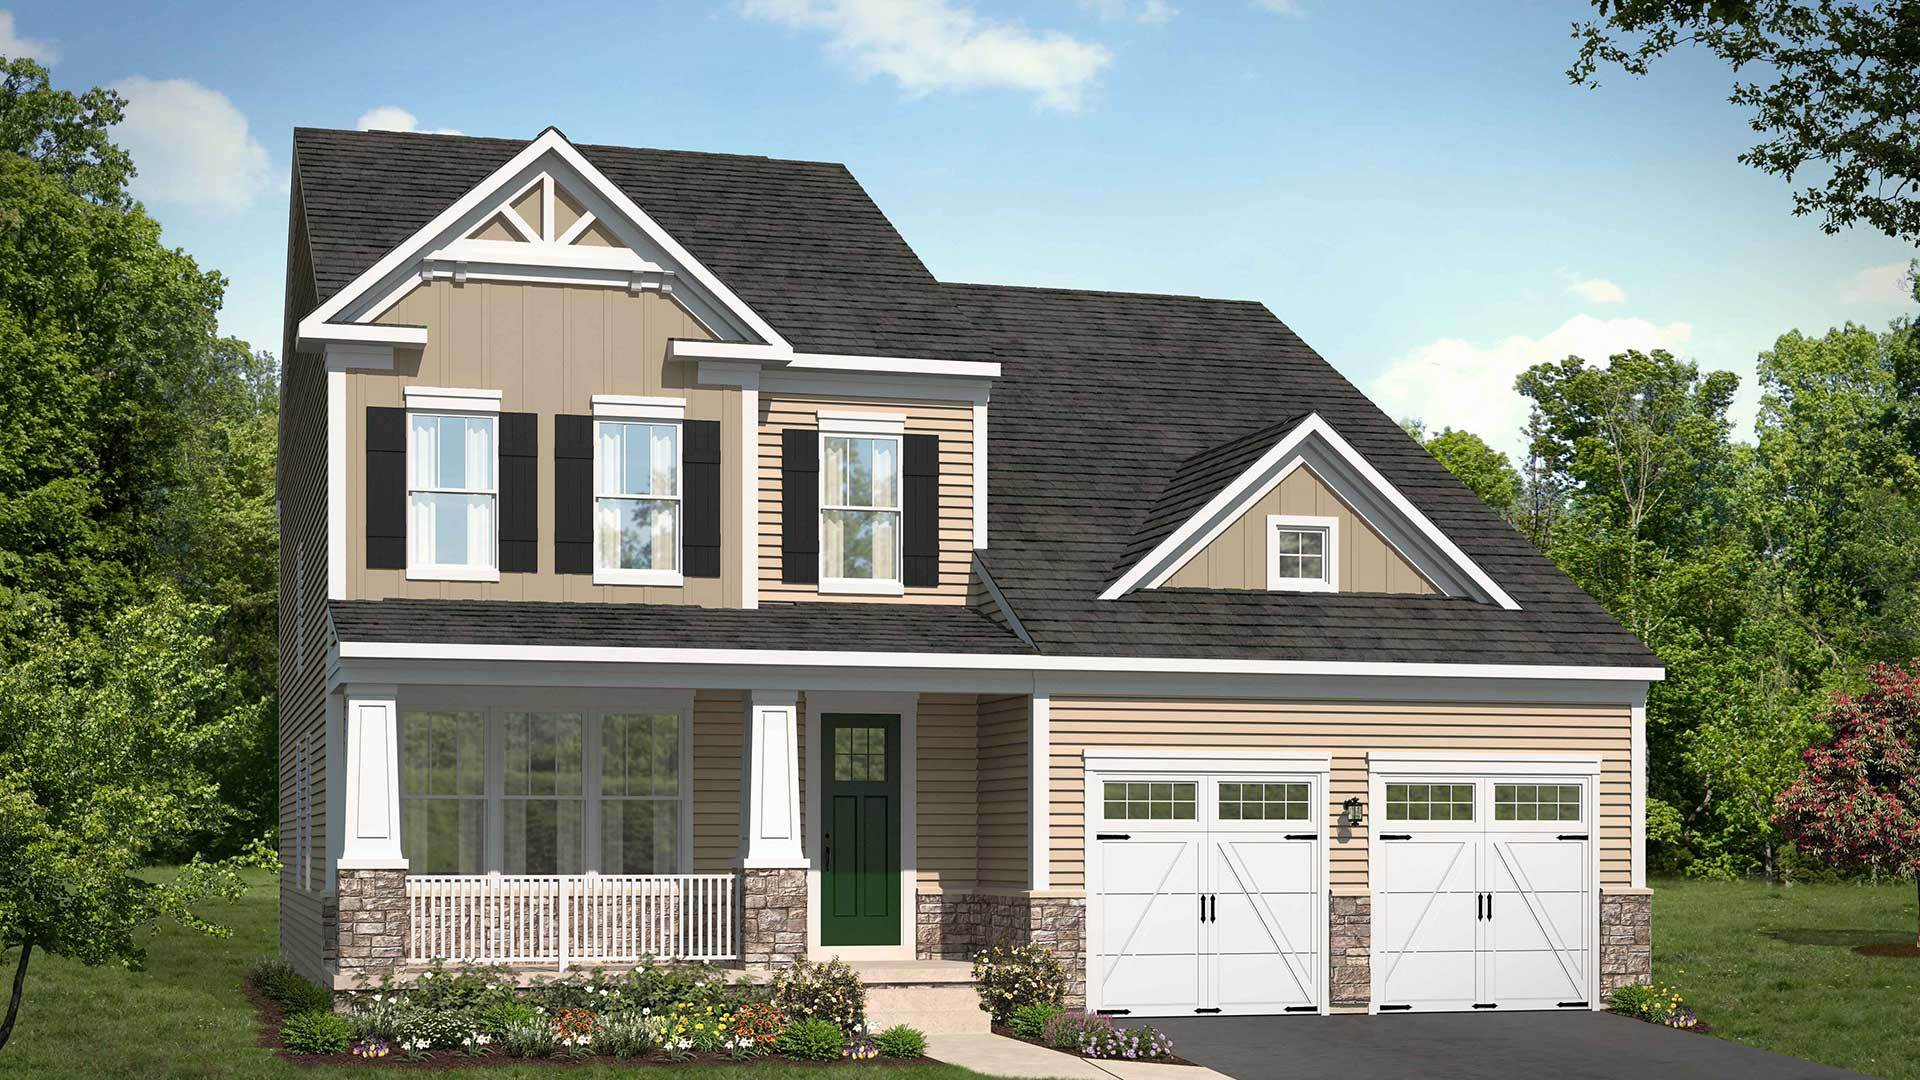 Lexington-Design-at-North Hills-in-Waldorf